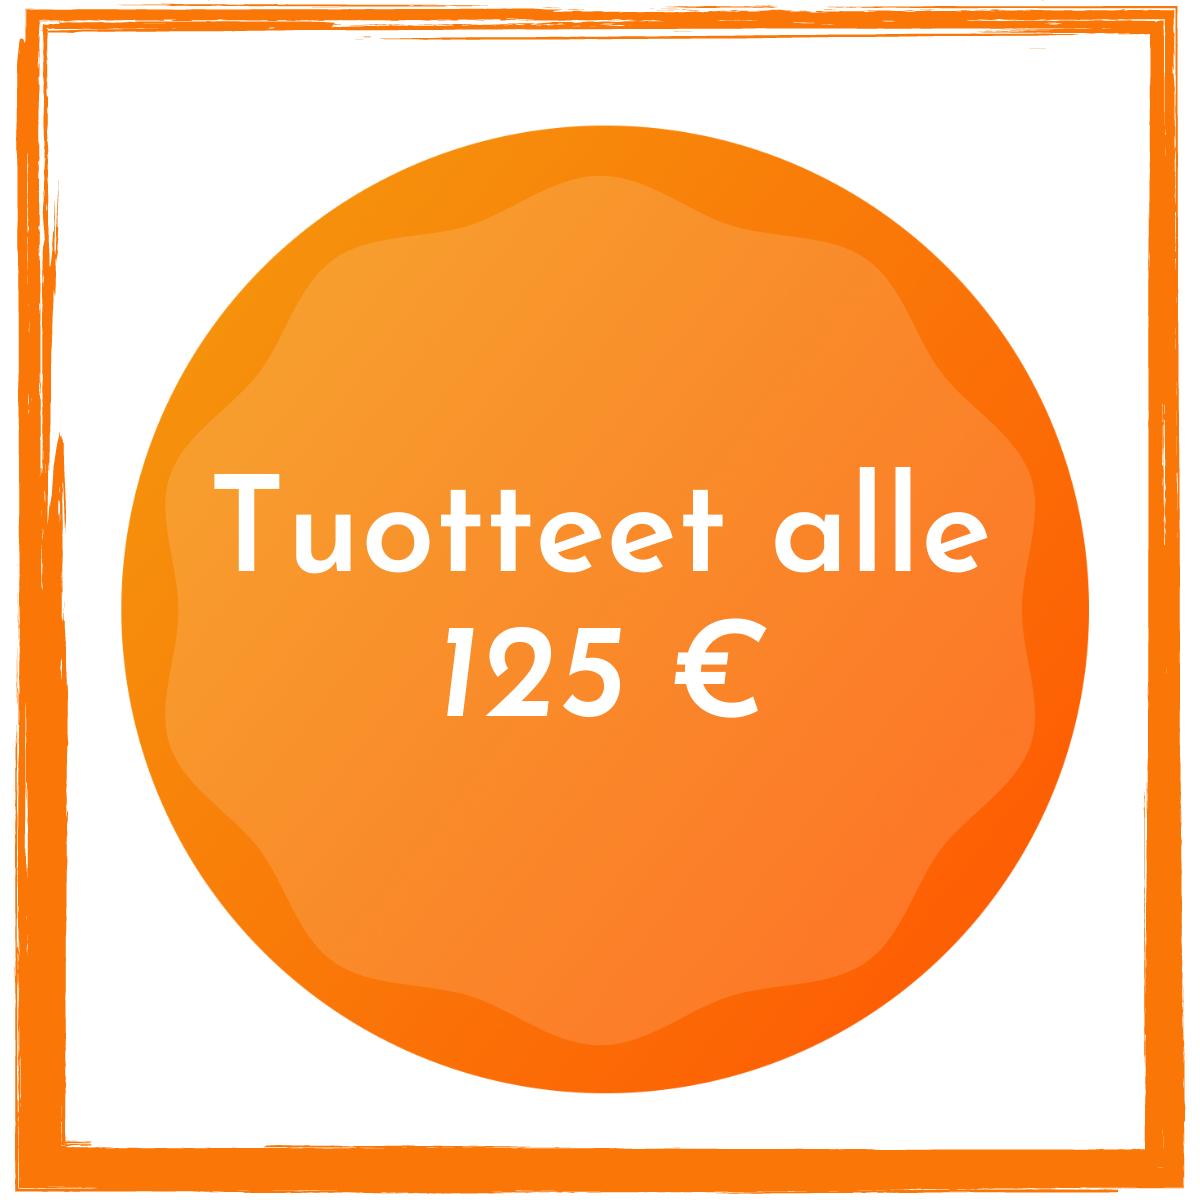 Alle 125 euroa